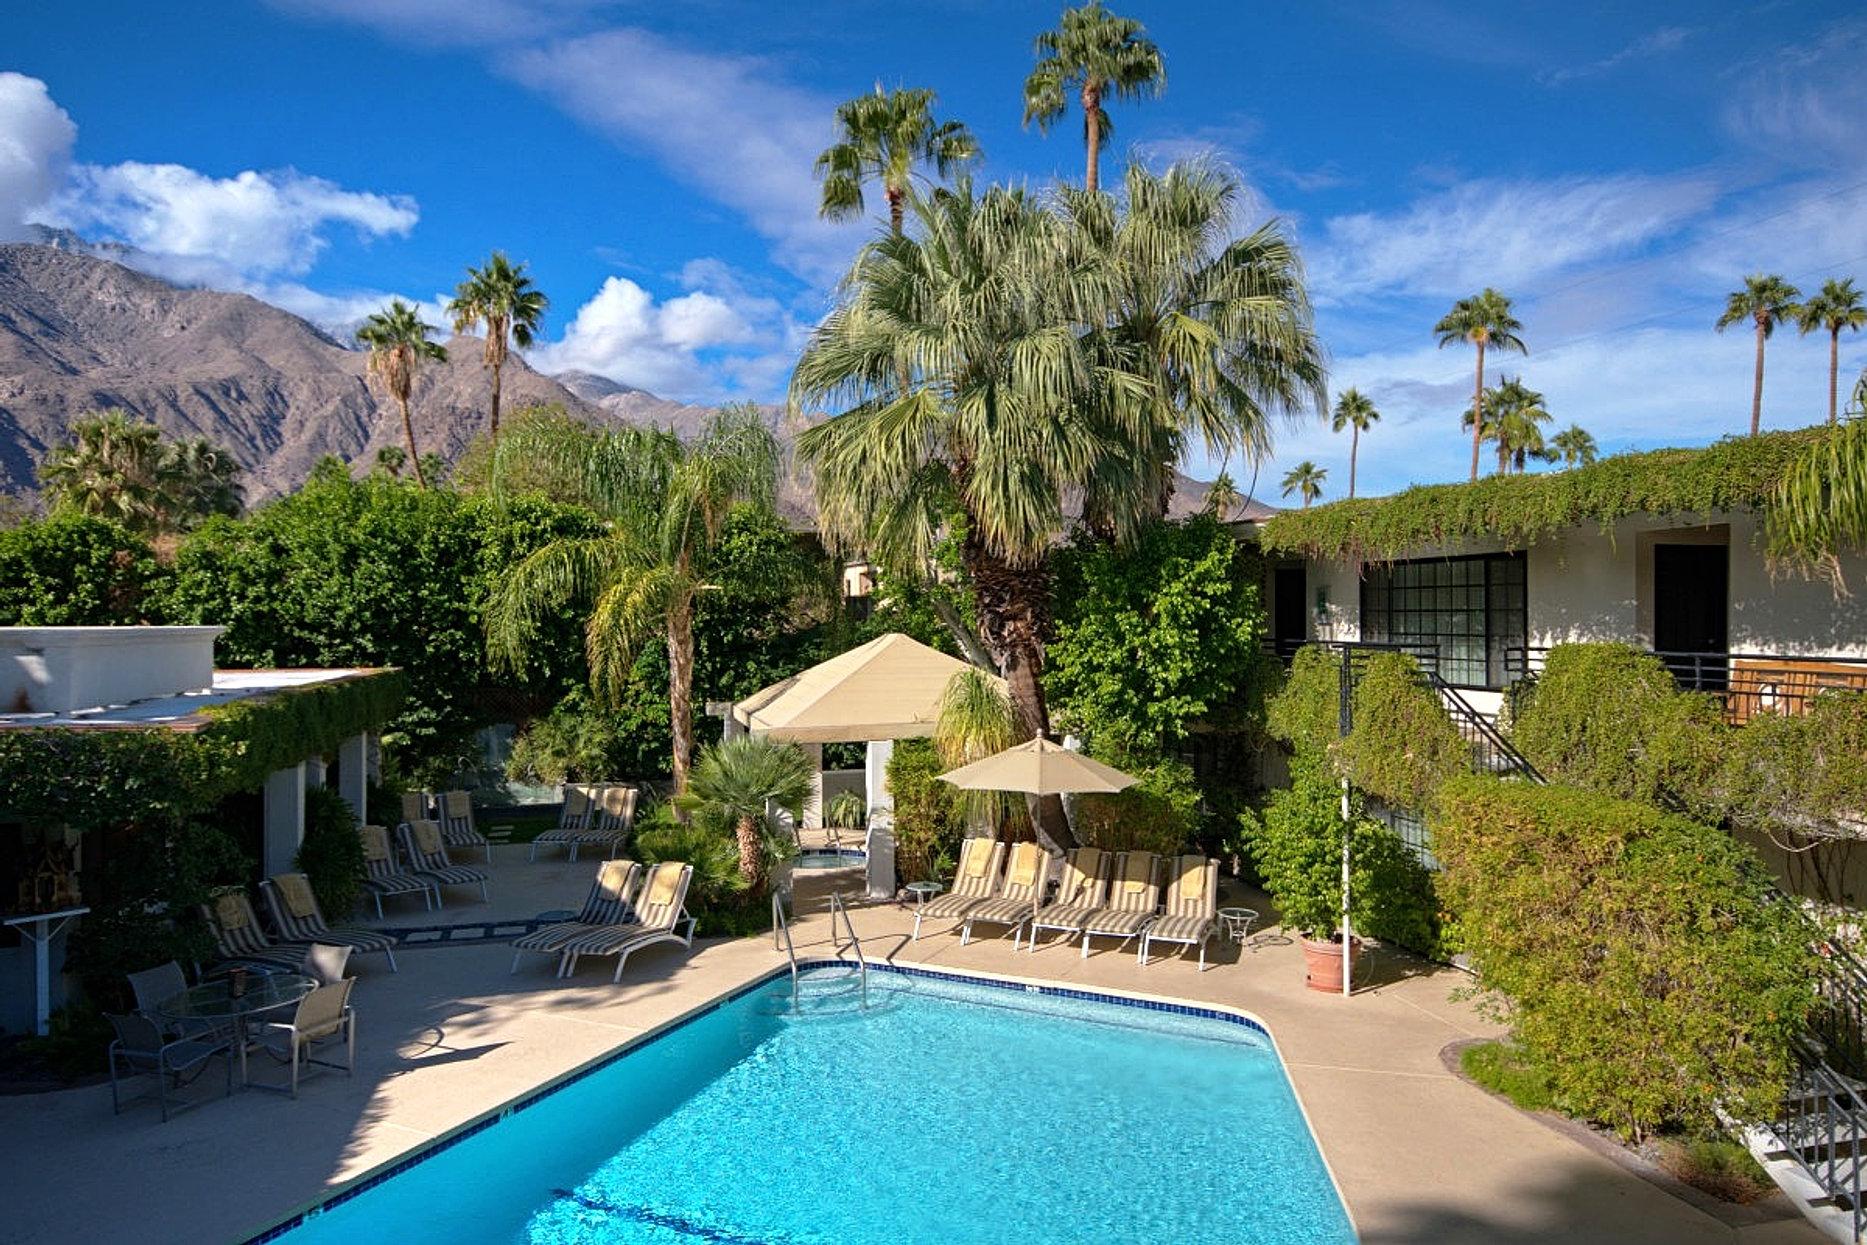 lush tropical poolside setting - Canyons Resort Hotels